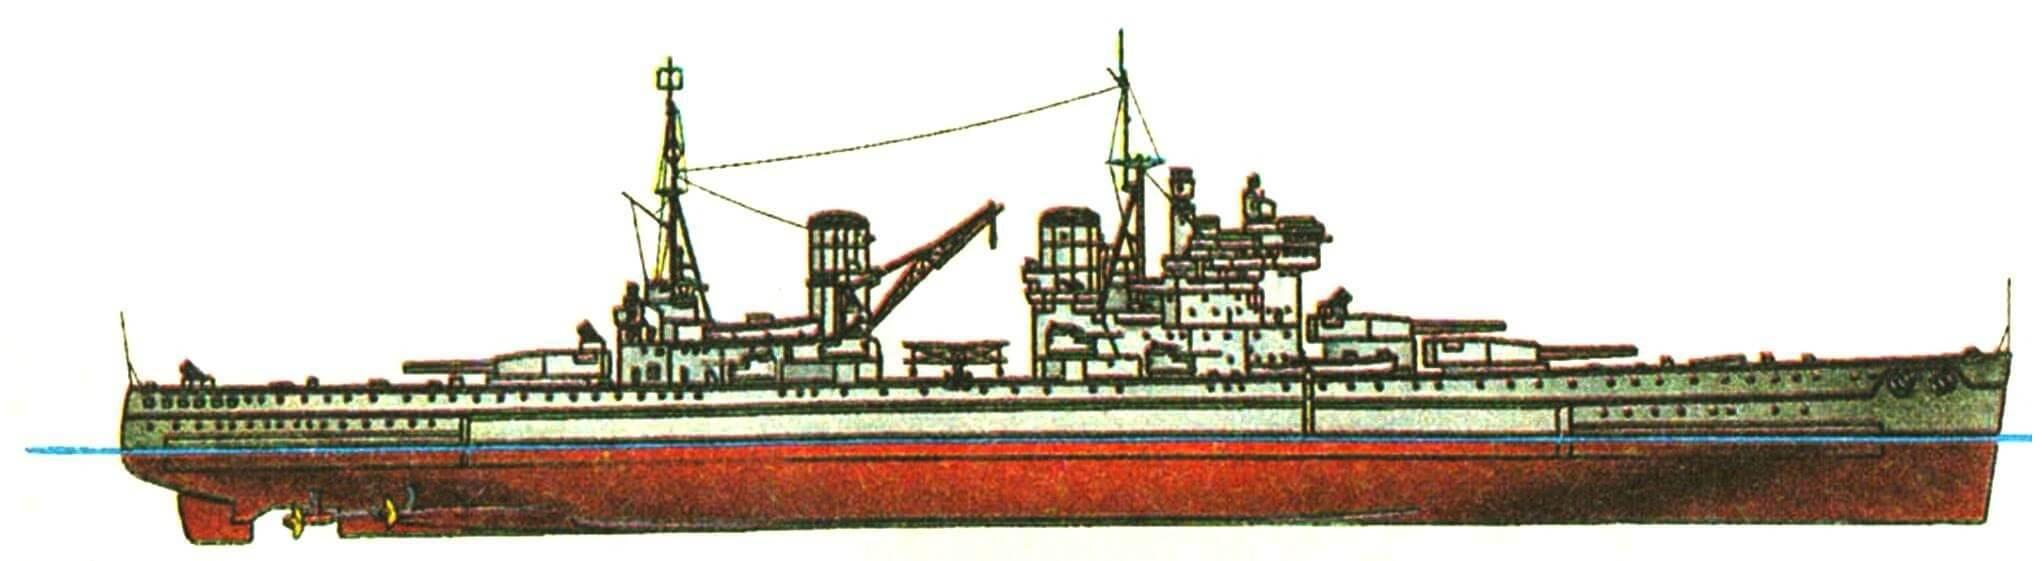 221. Линейный корабль «КИНГ ДЖОРДЖ V», Англия, 1941 г.